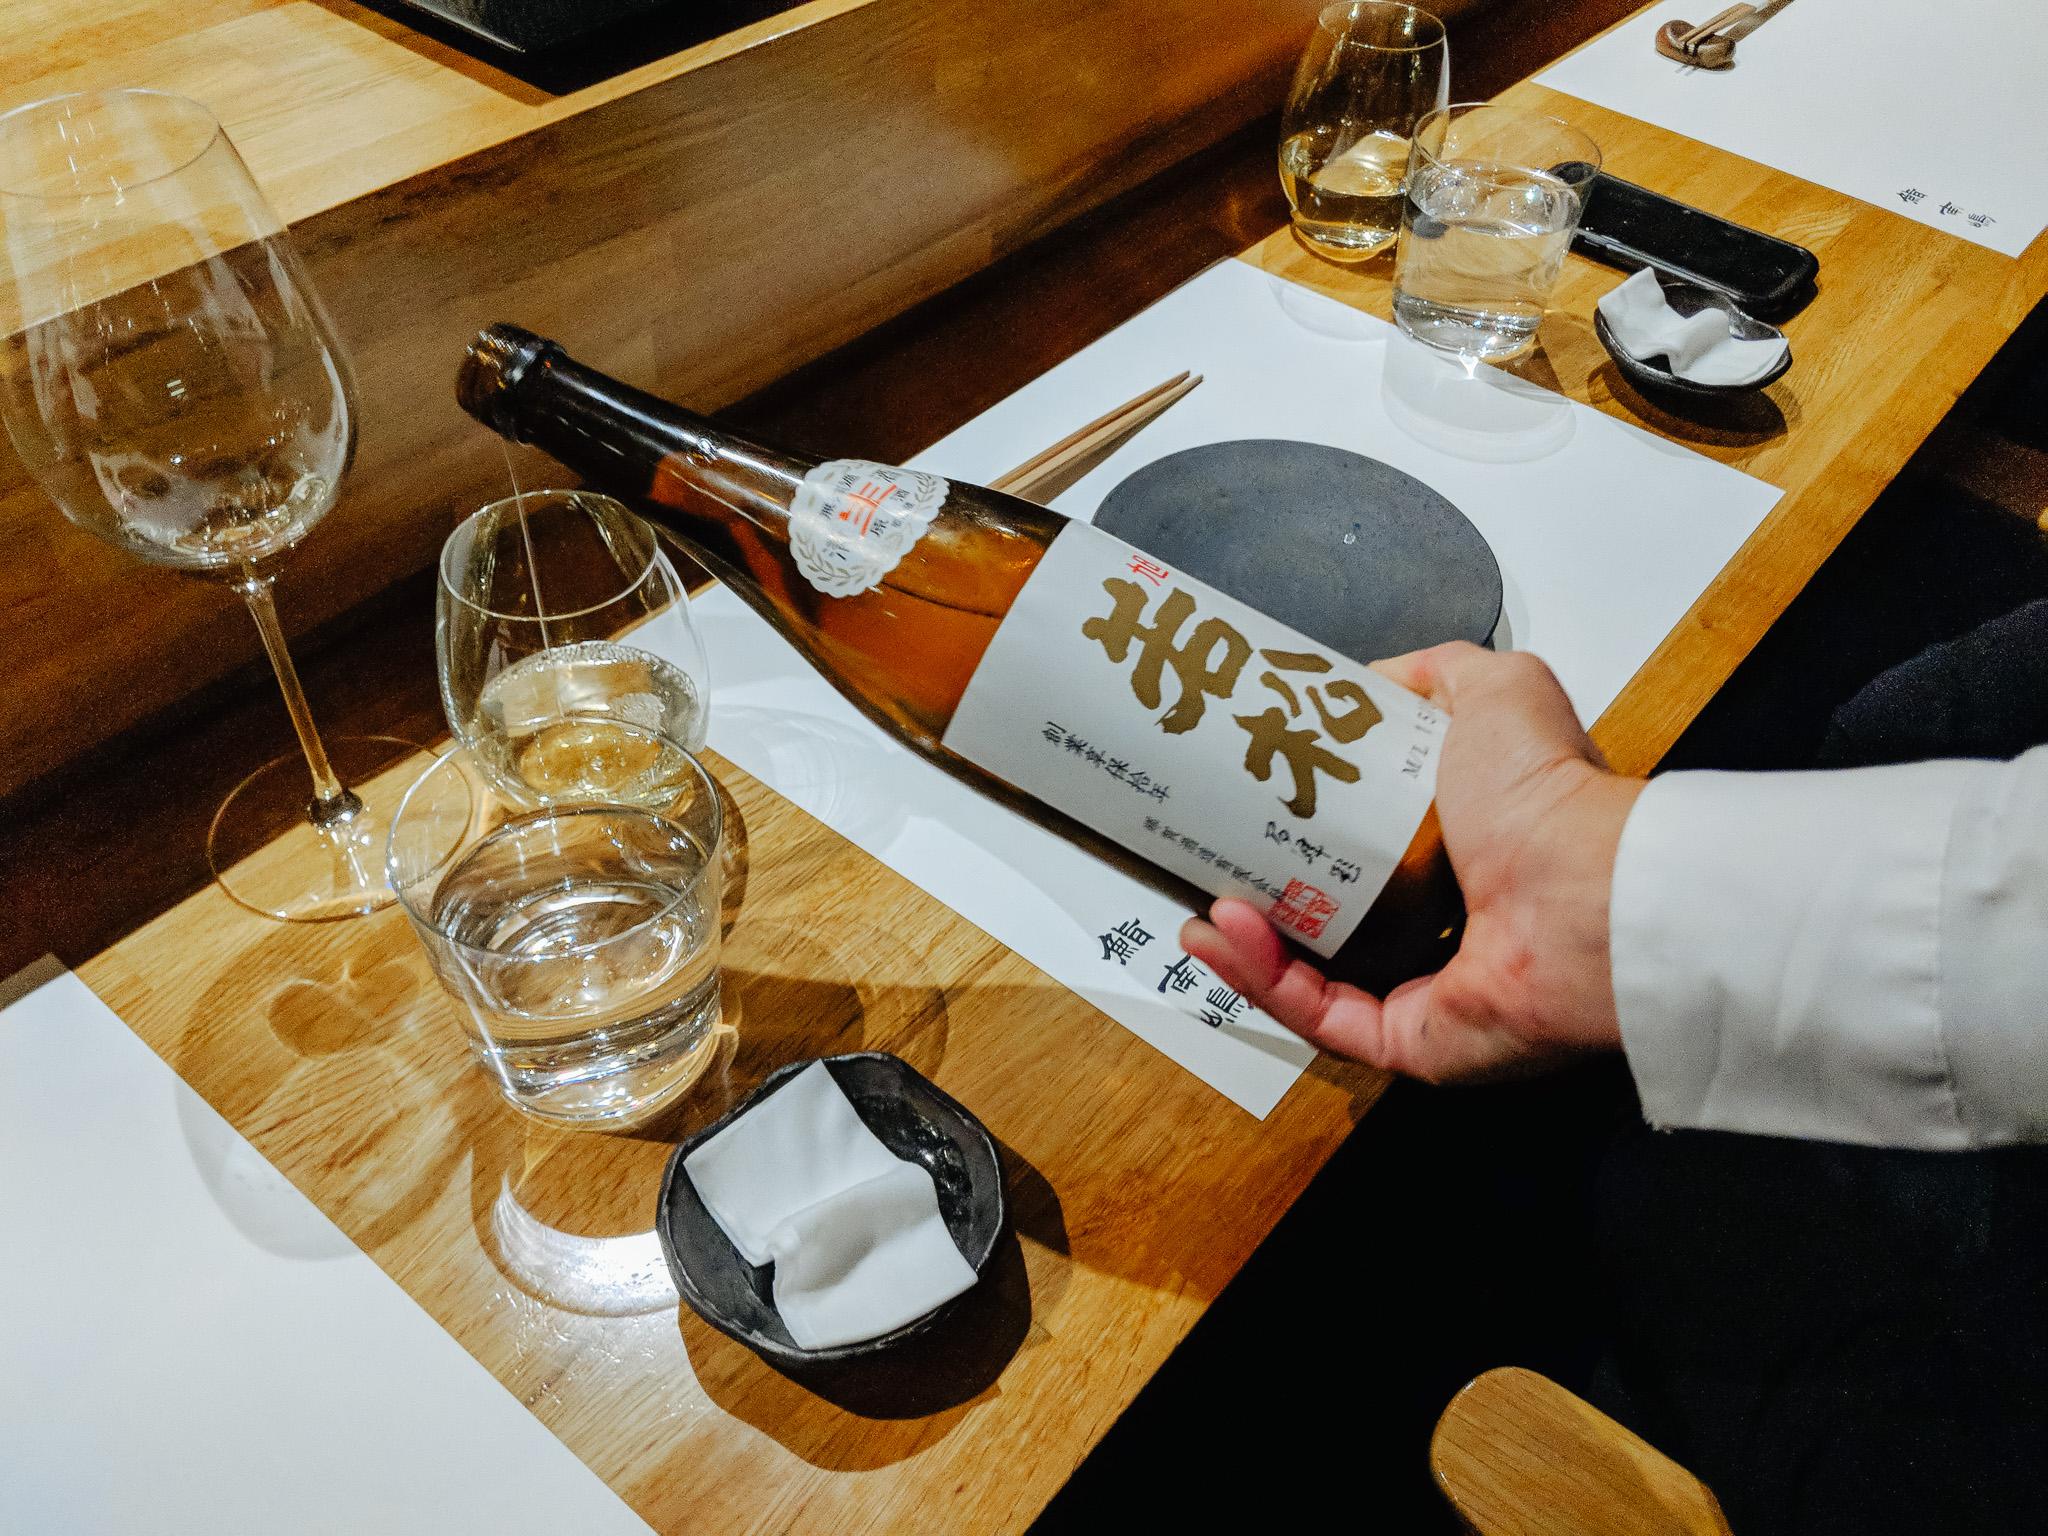 minamishima-melbourne-food-photographer-009.JPG